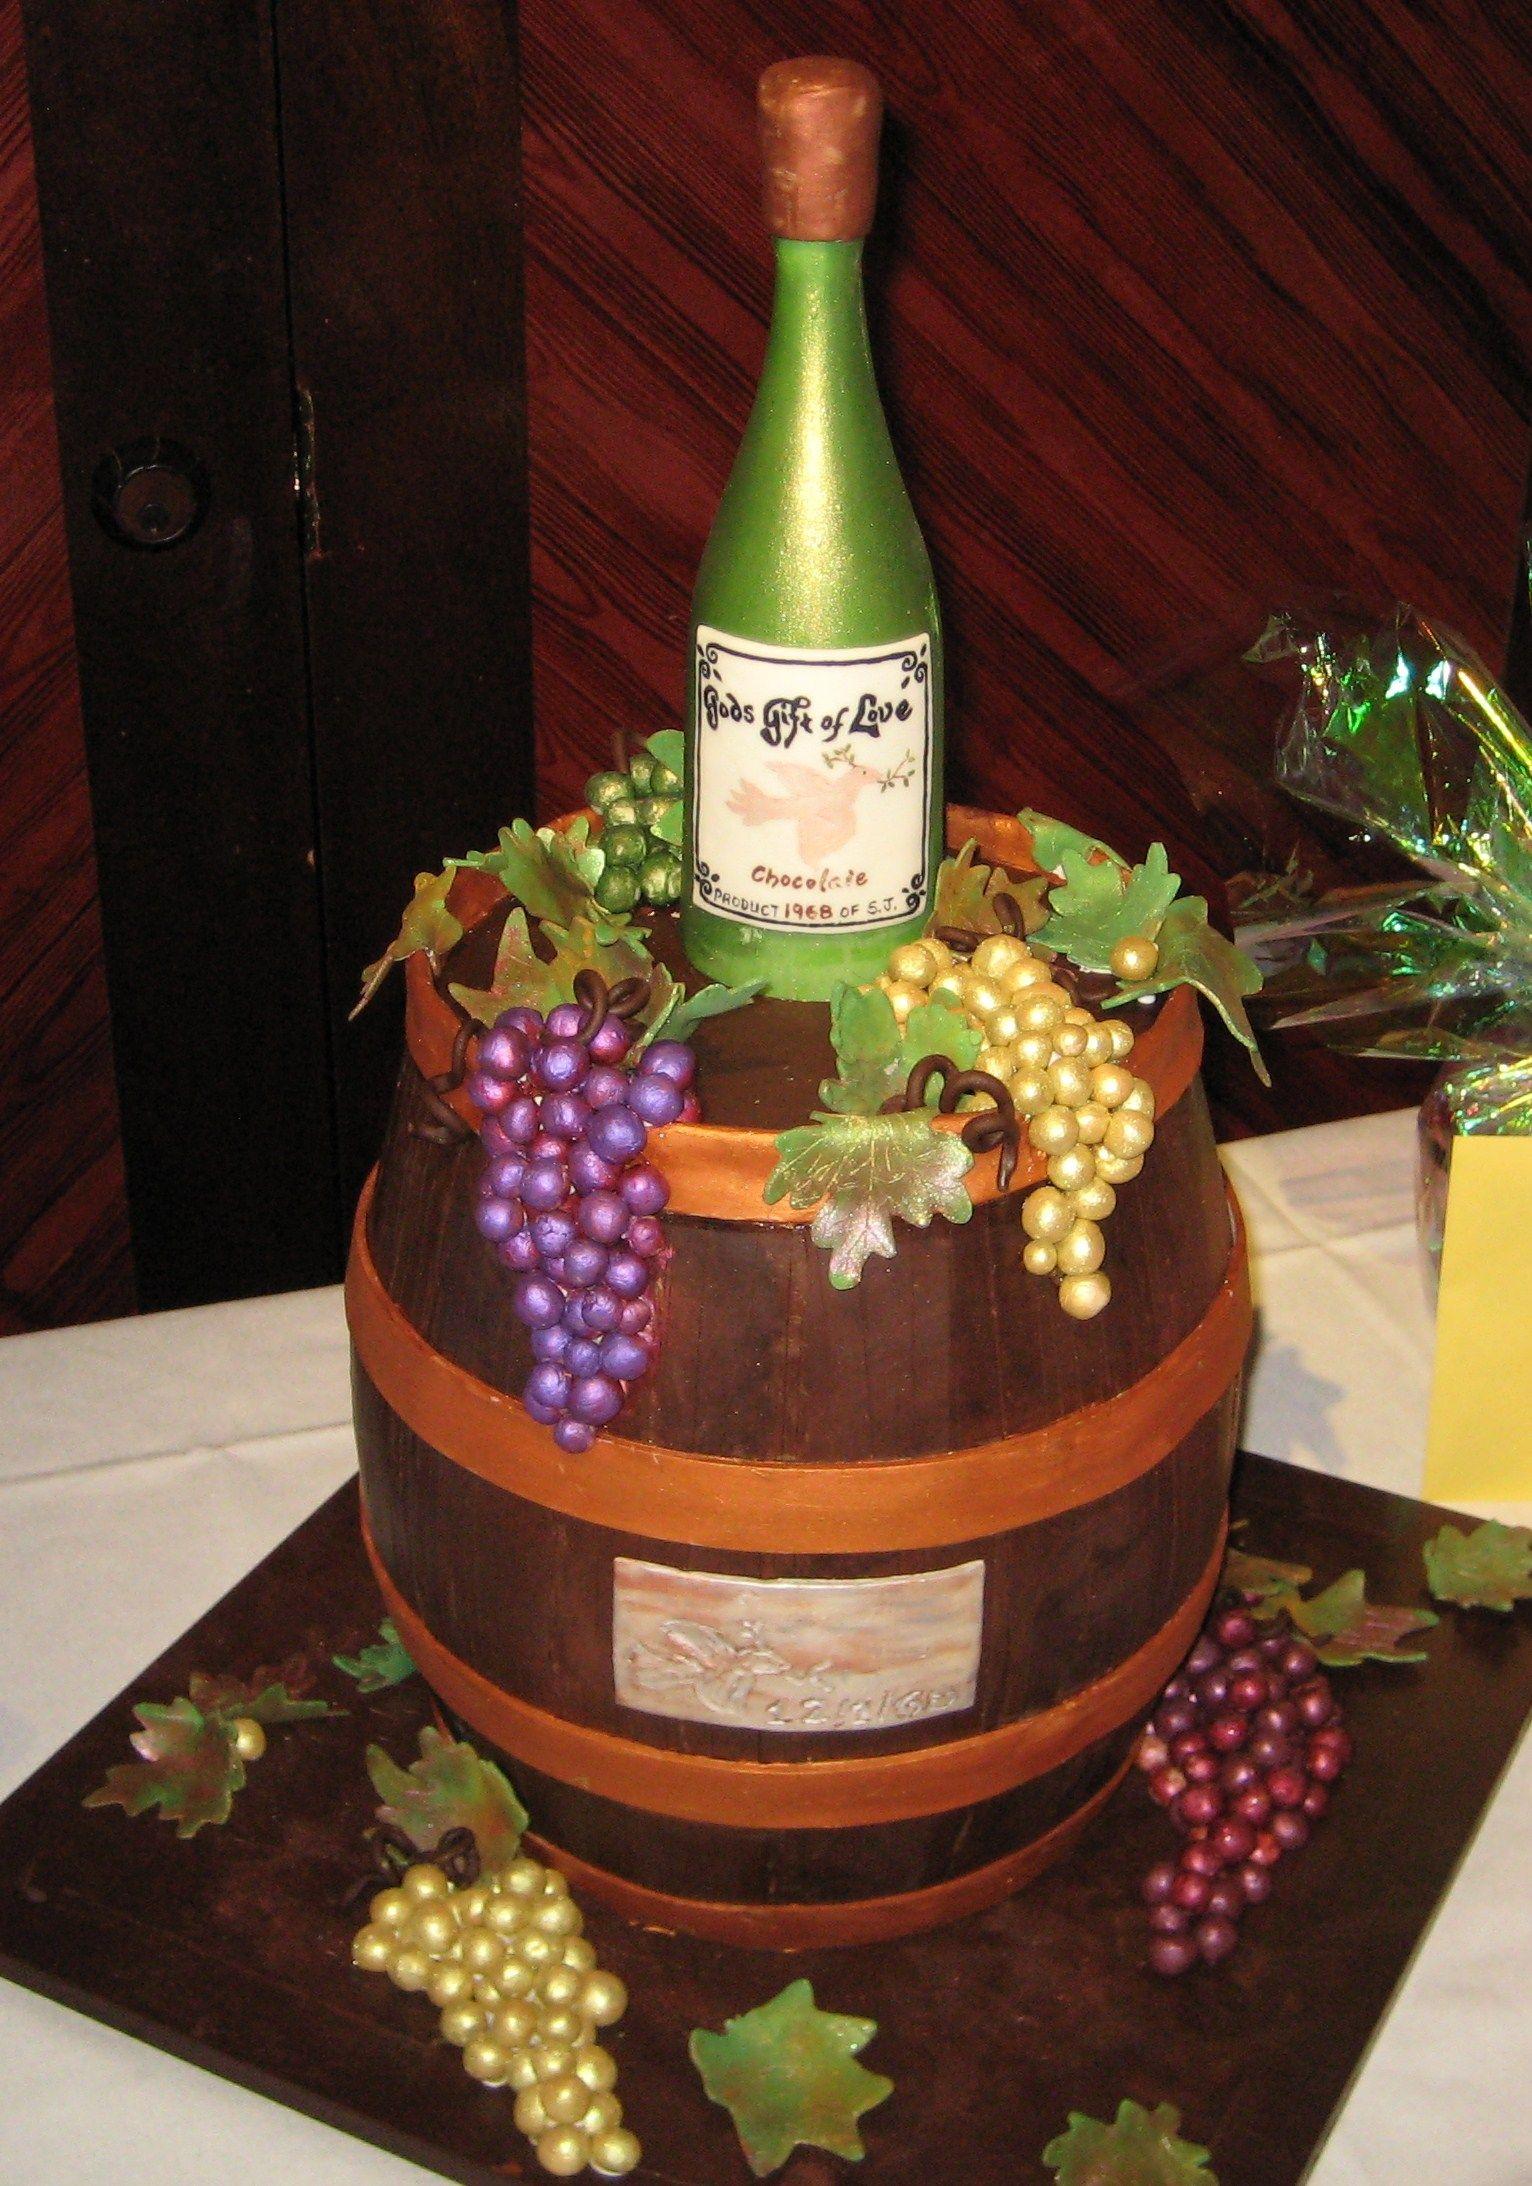 Wine Celebration Birthday - Covered in dark chocolate and ...